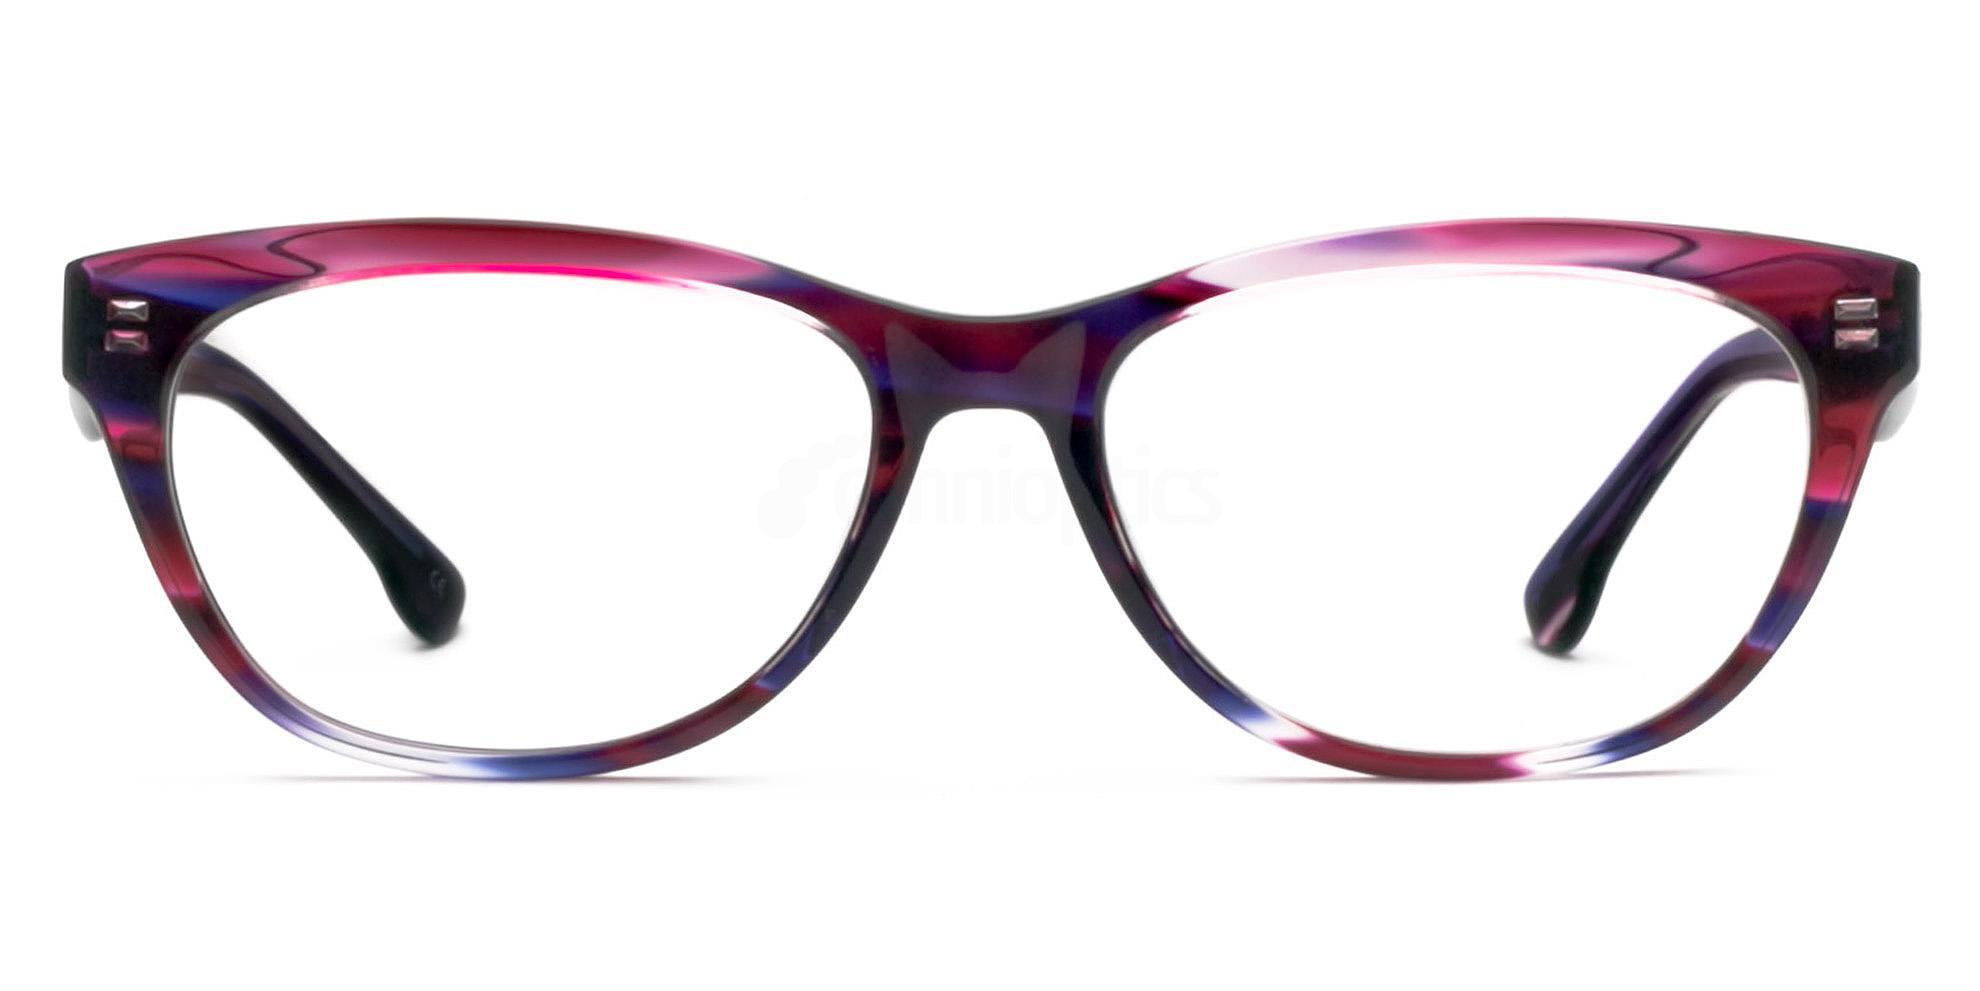 C2 HY81096 Glasses, Hallmark